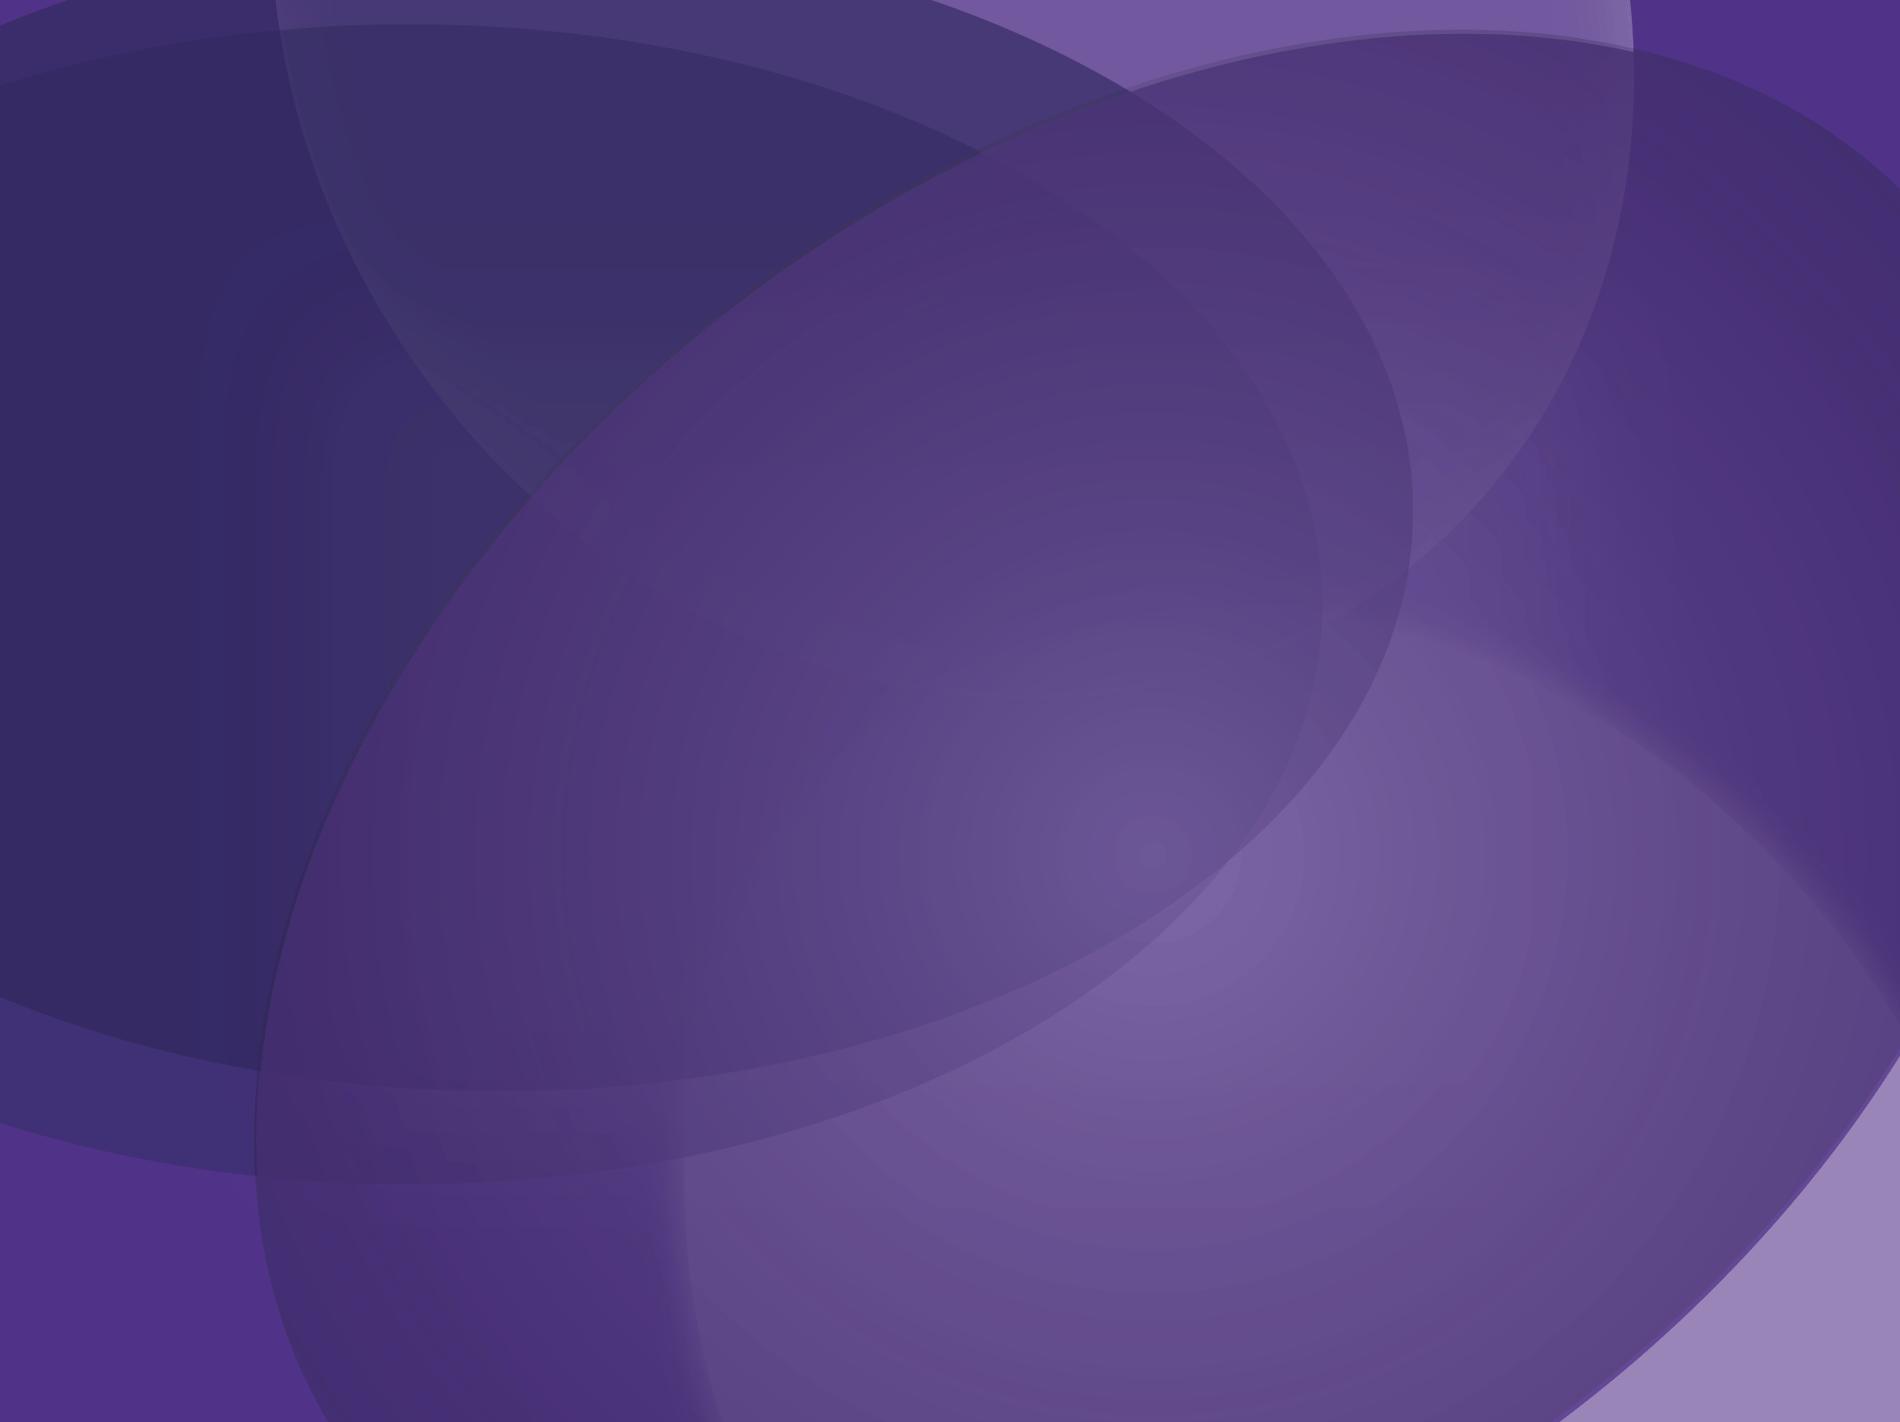 Purple background image